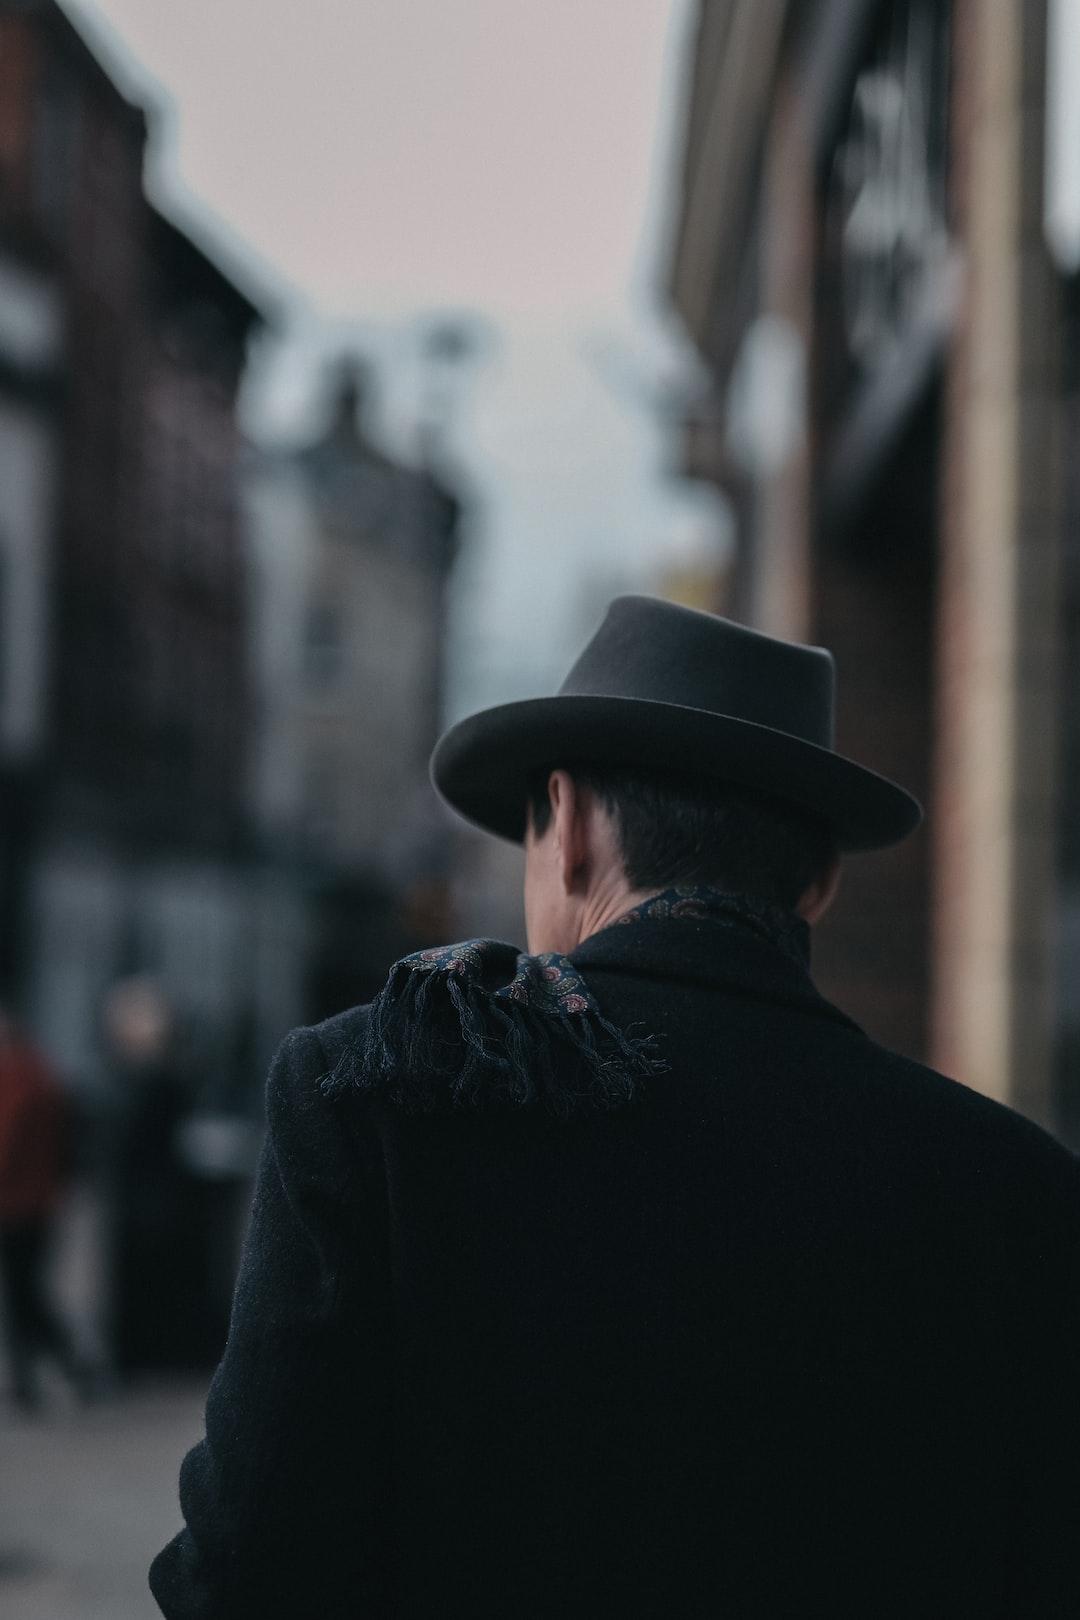 Man in hat facing away